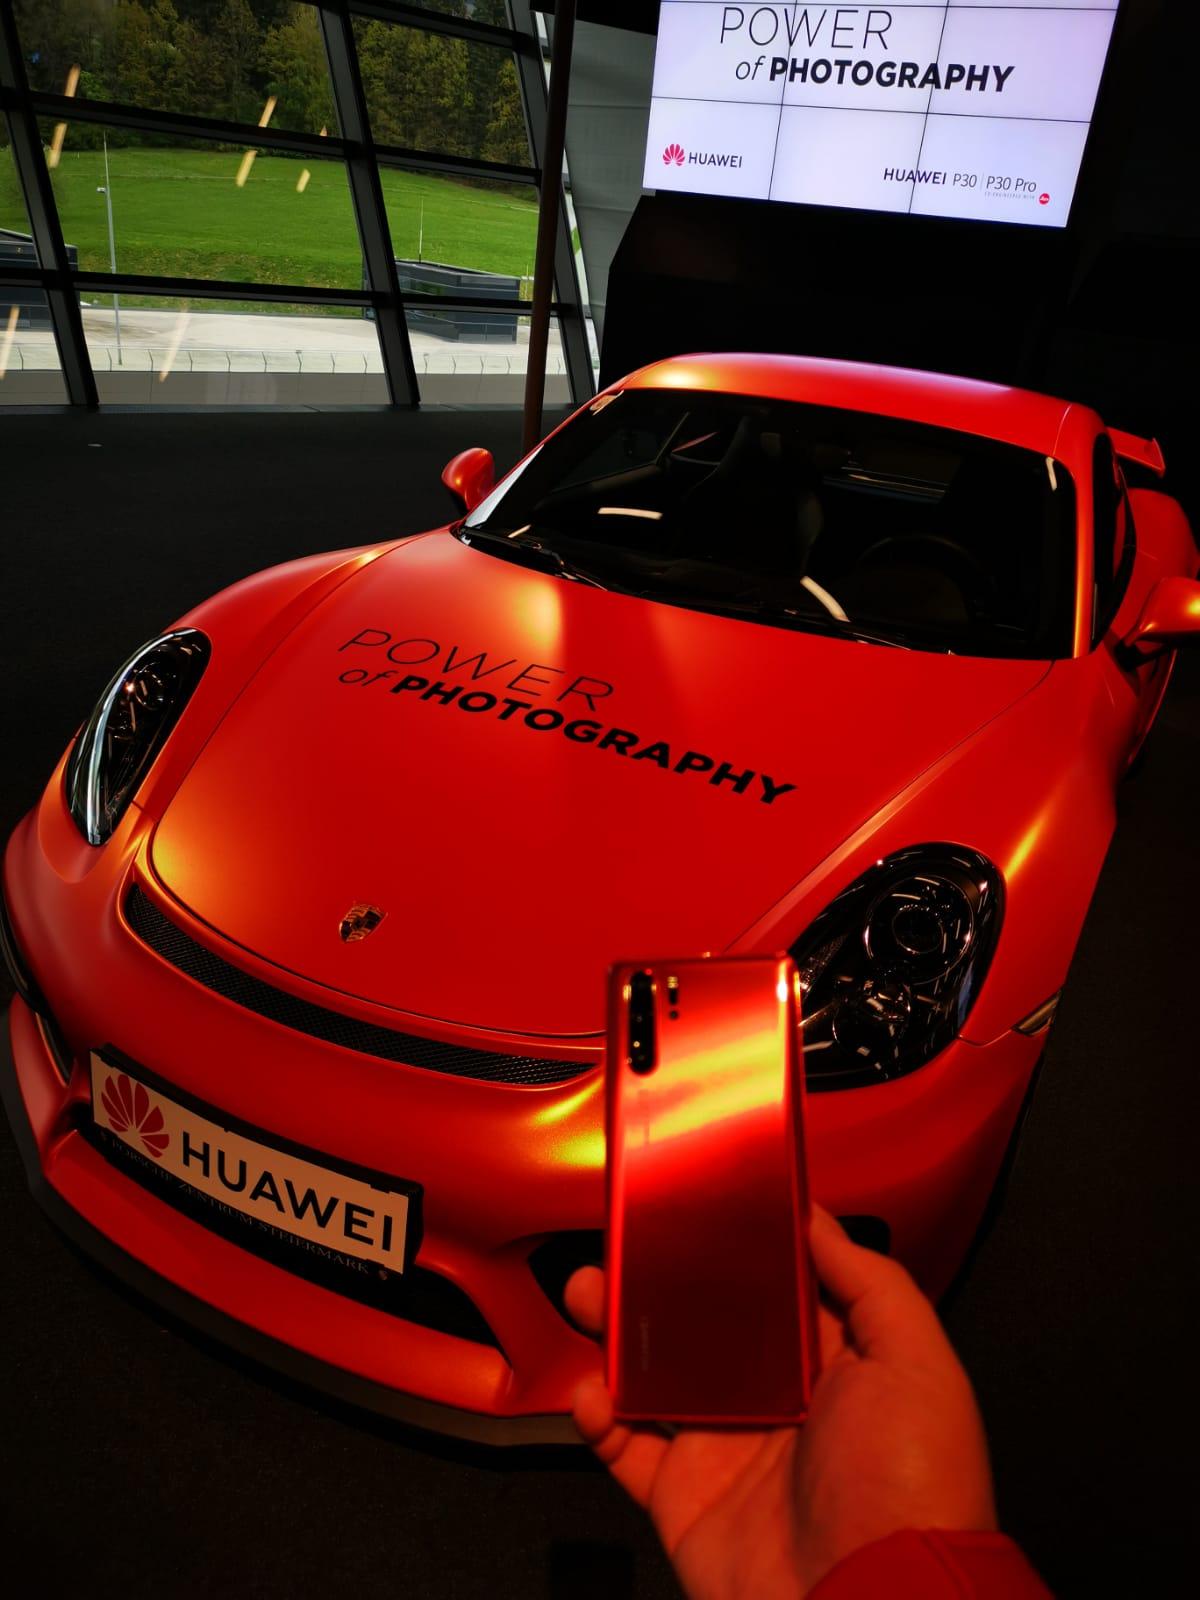 Huawei_Porsche Amber Sunrise 9.png